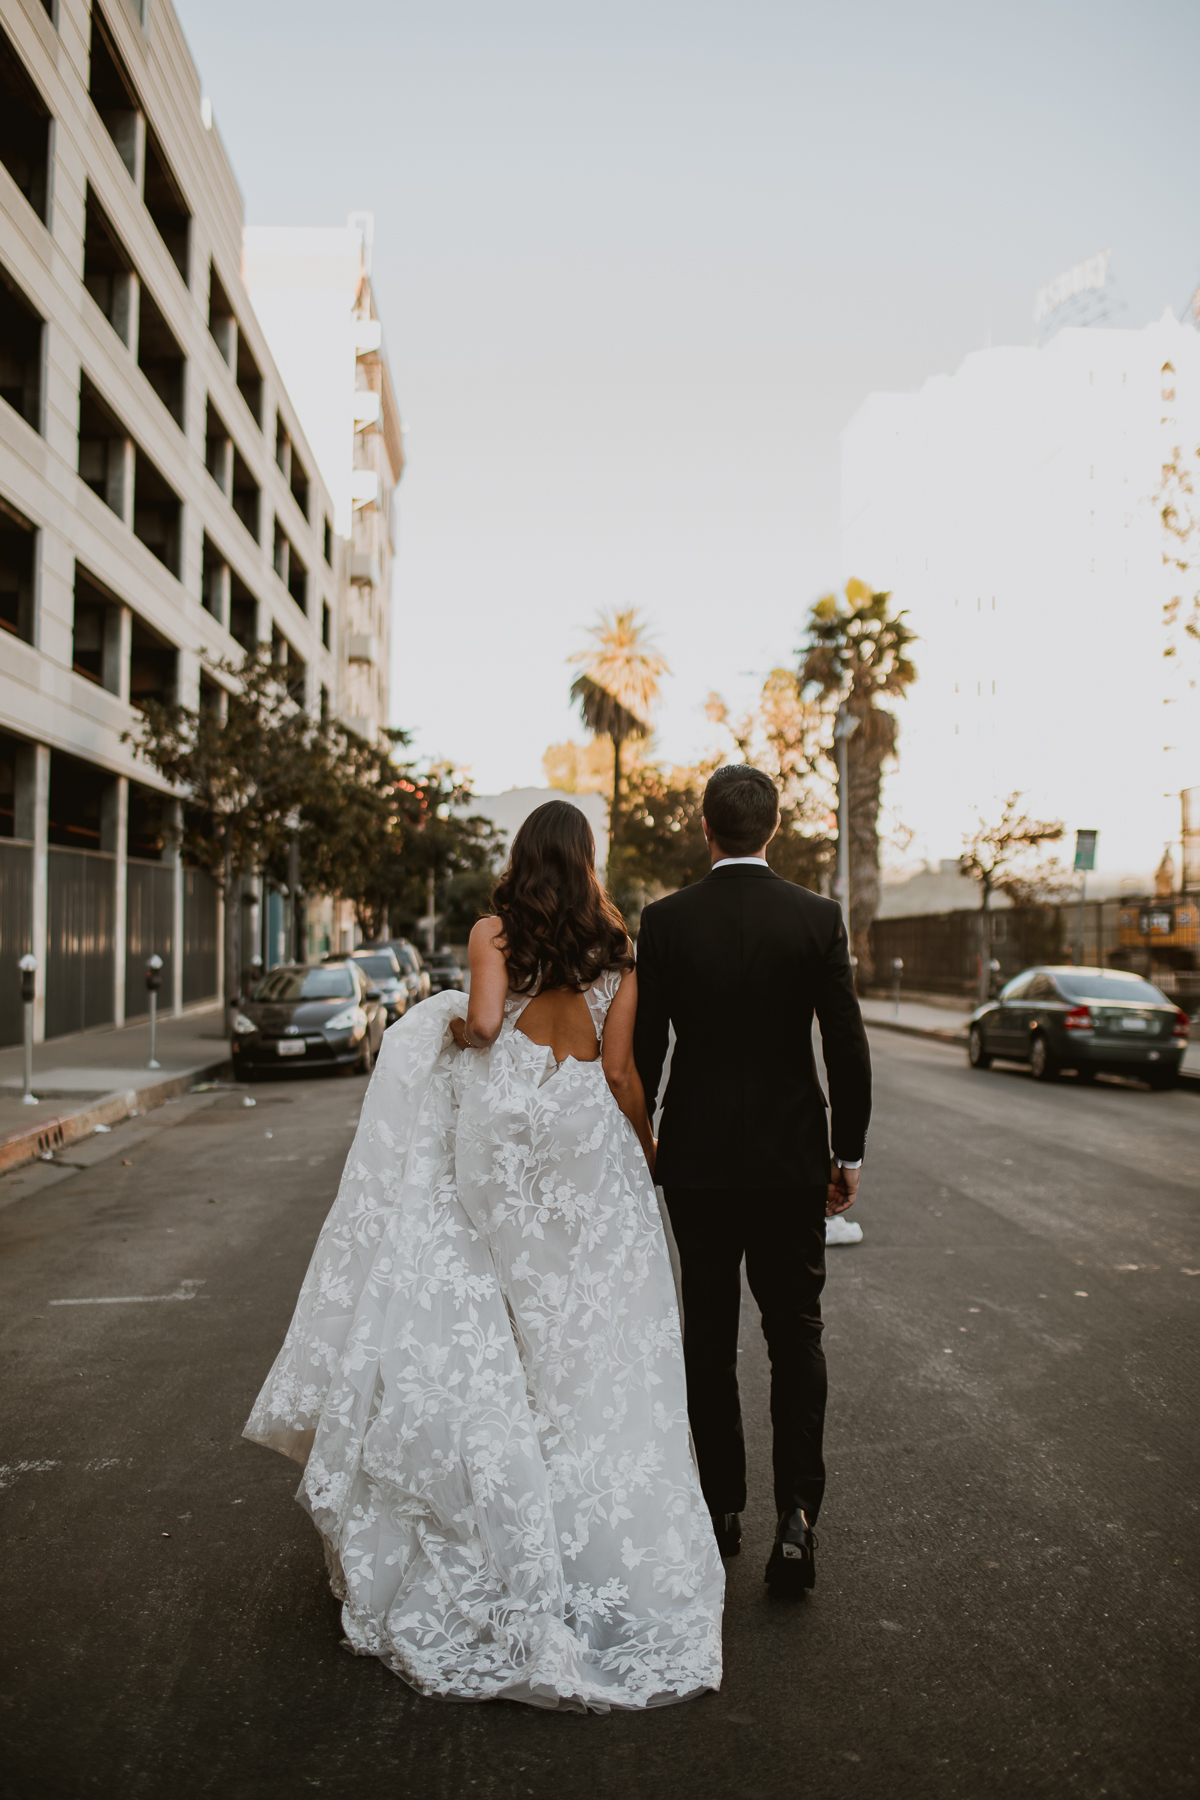 carondelet-house-kelley-raye-los-angeles-wedding-photographer-56.jpg